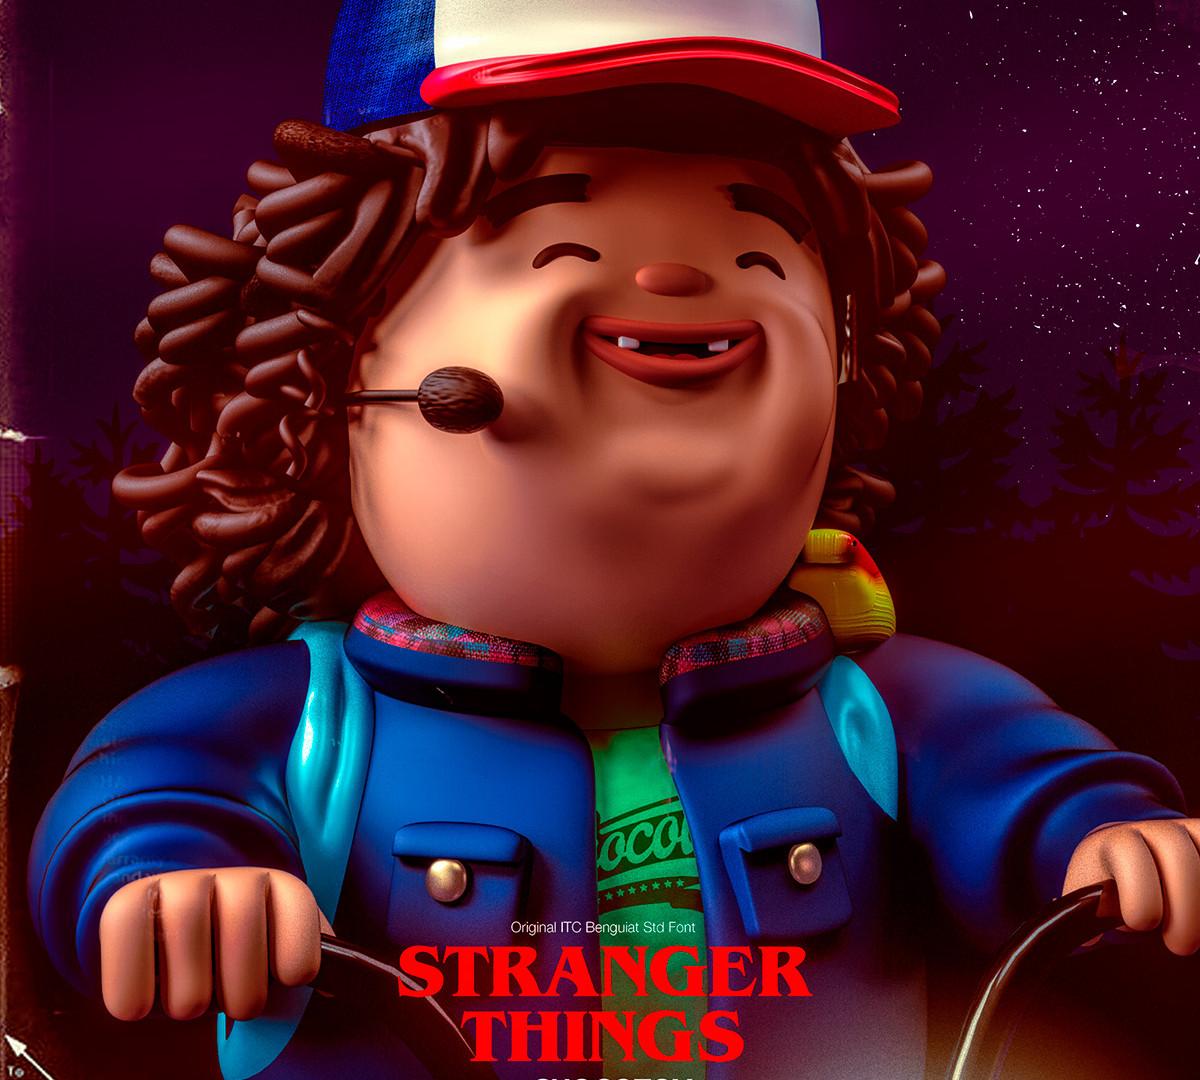 Strangerthings x Chocotoy